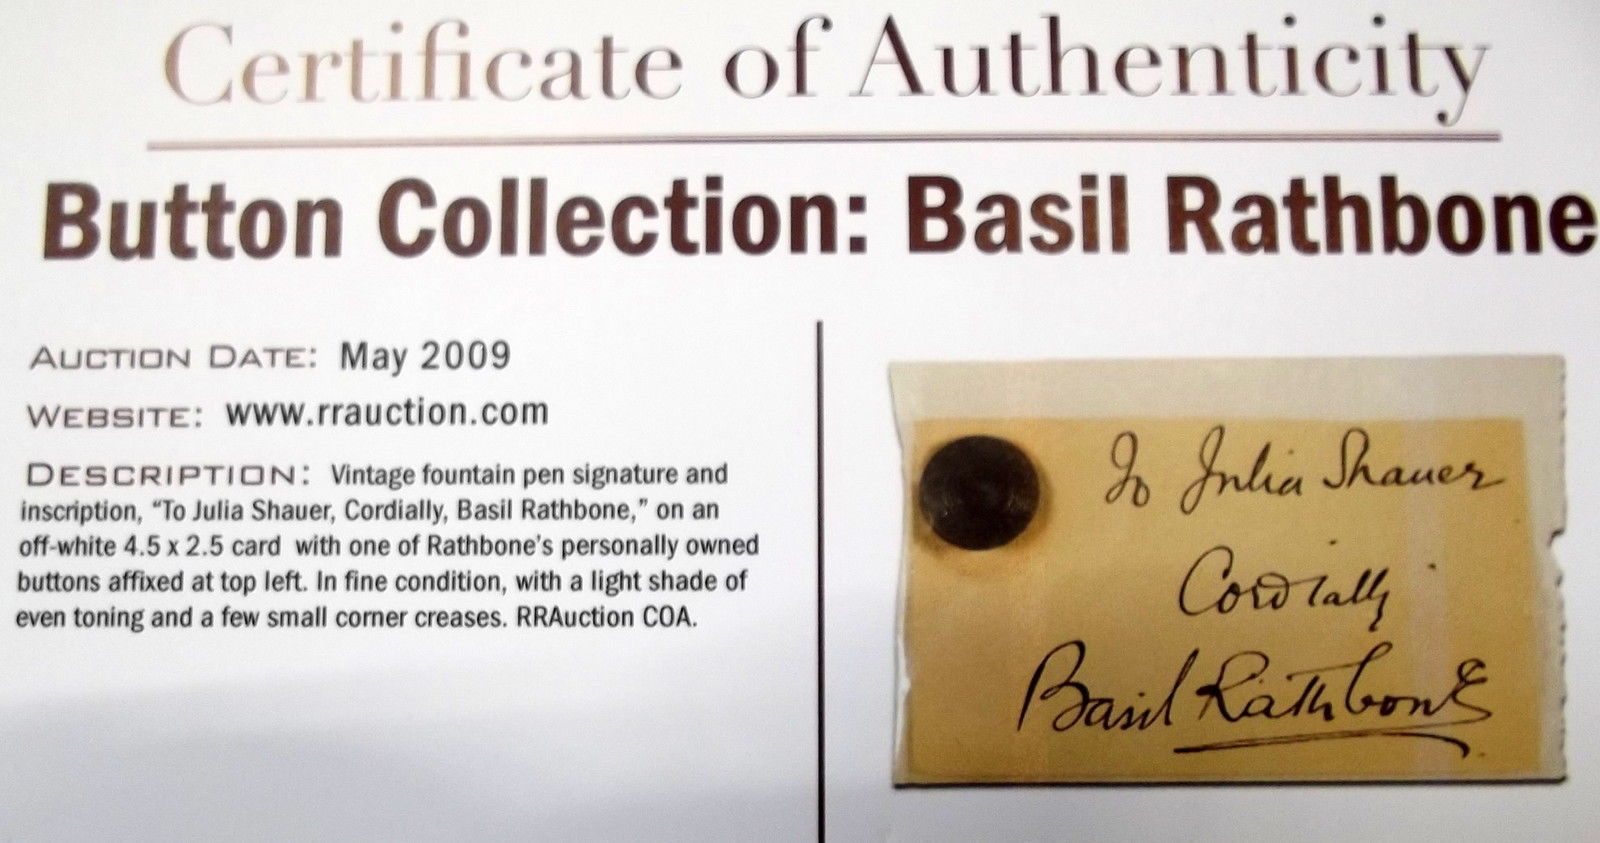 BASIL RATHBONE (ADVENTURES OF ROBIN HOOD) ORIGINAL VINTAGE AUTOGRAPH